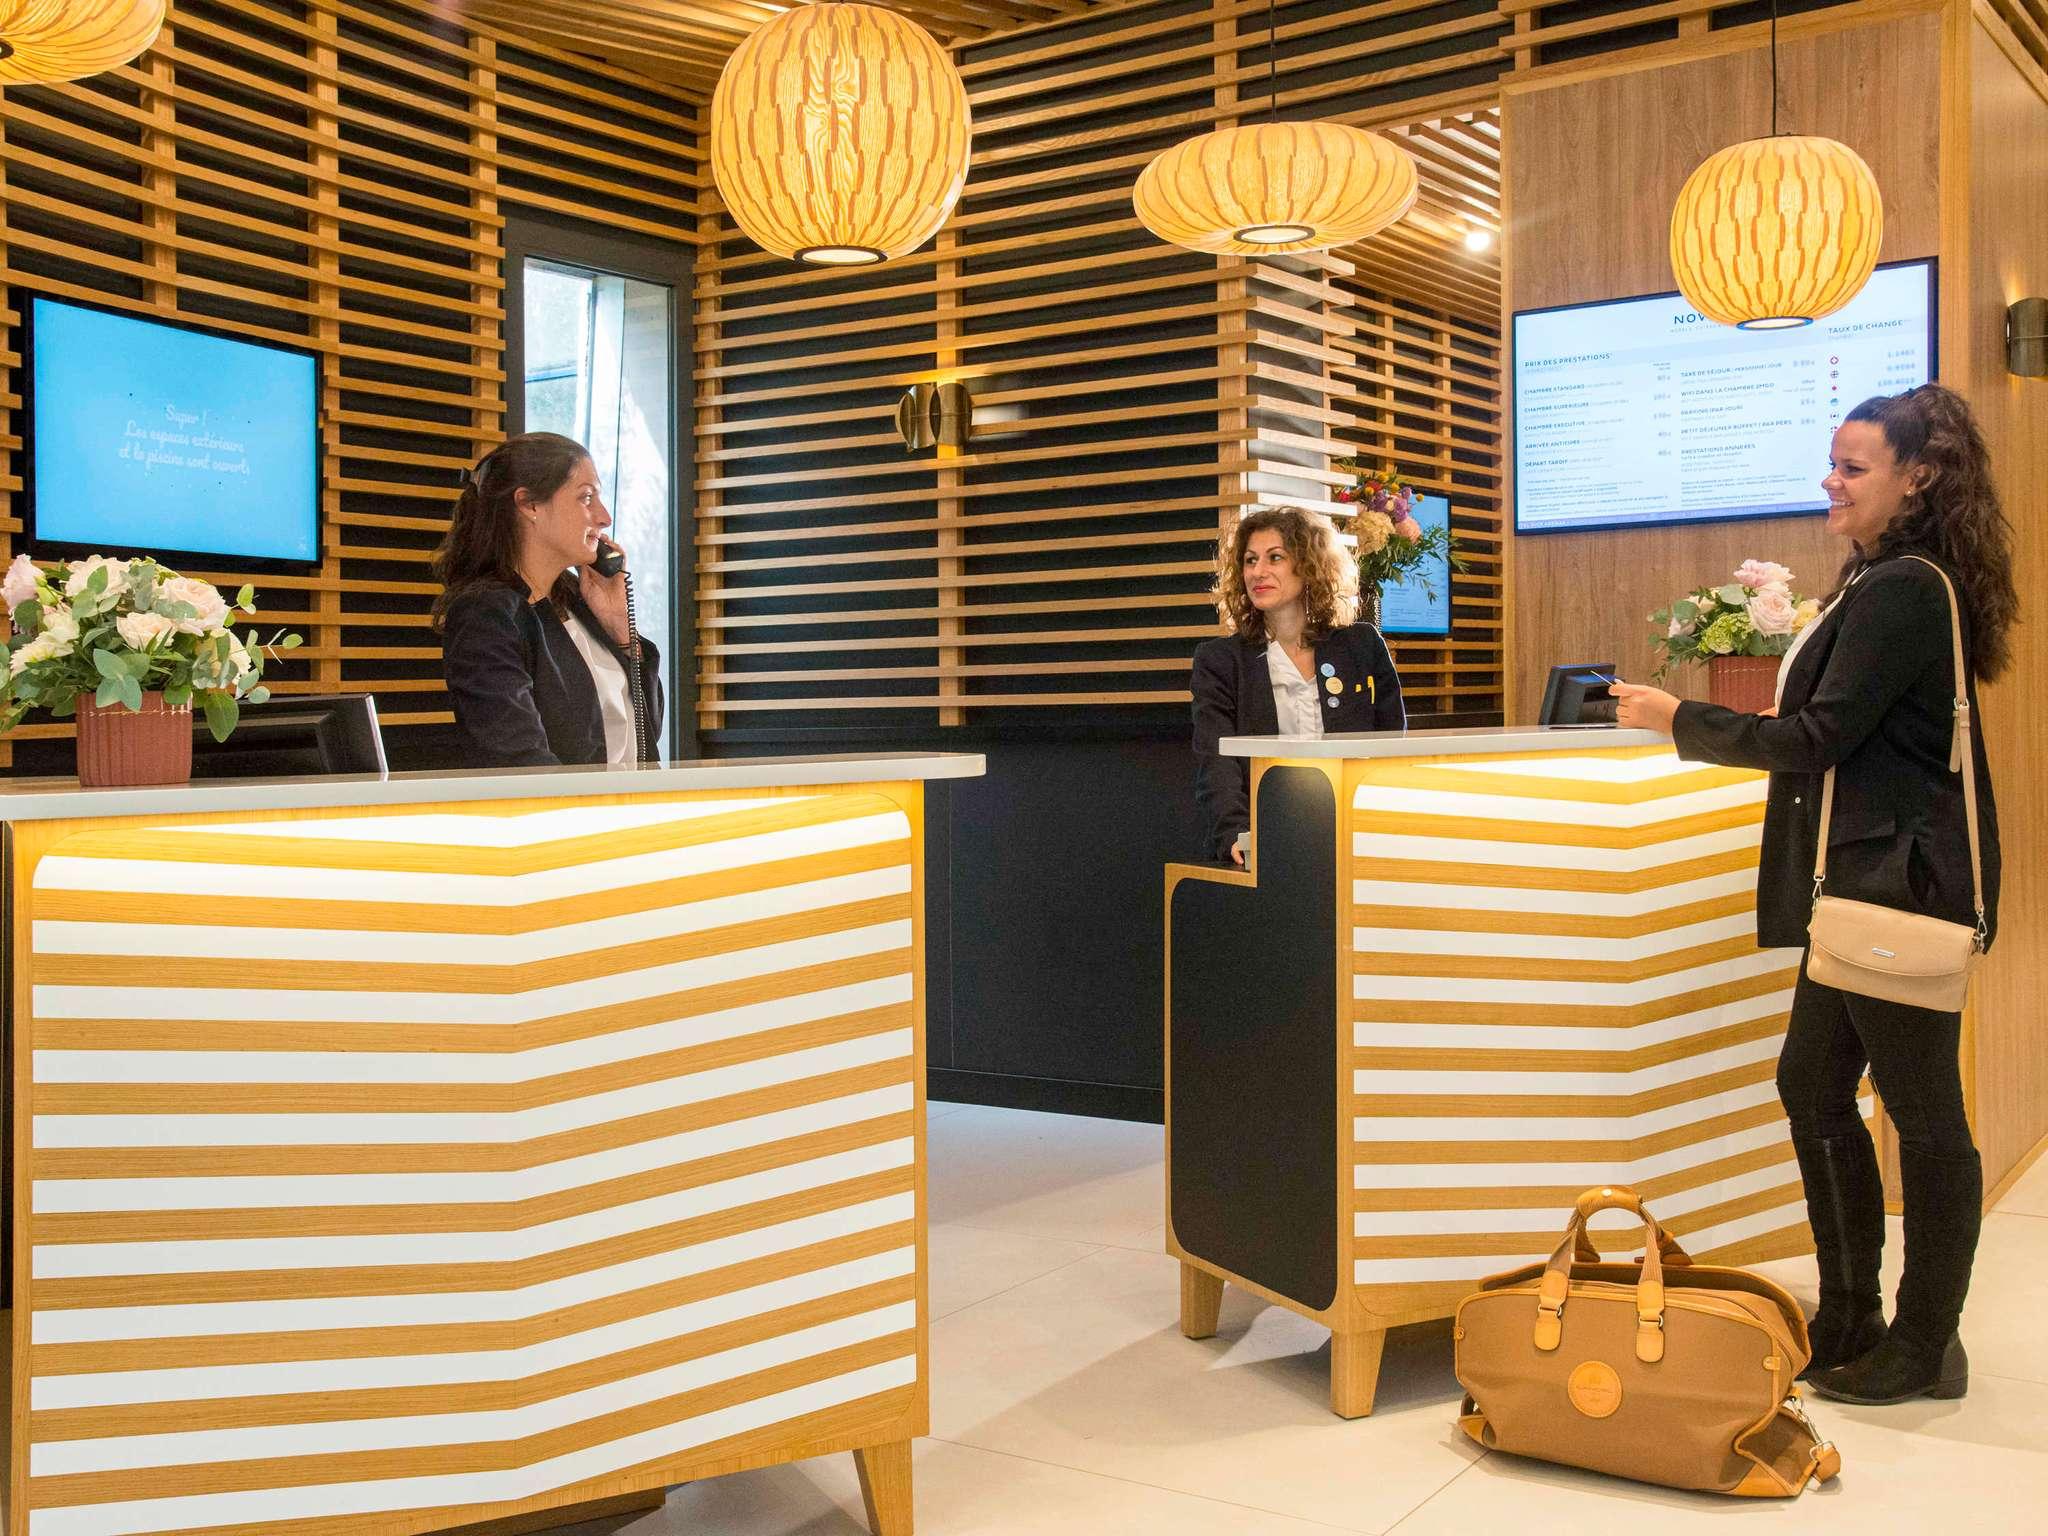 Hotel - Novotel Nice Arénas Aéroport